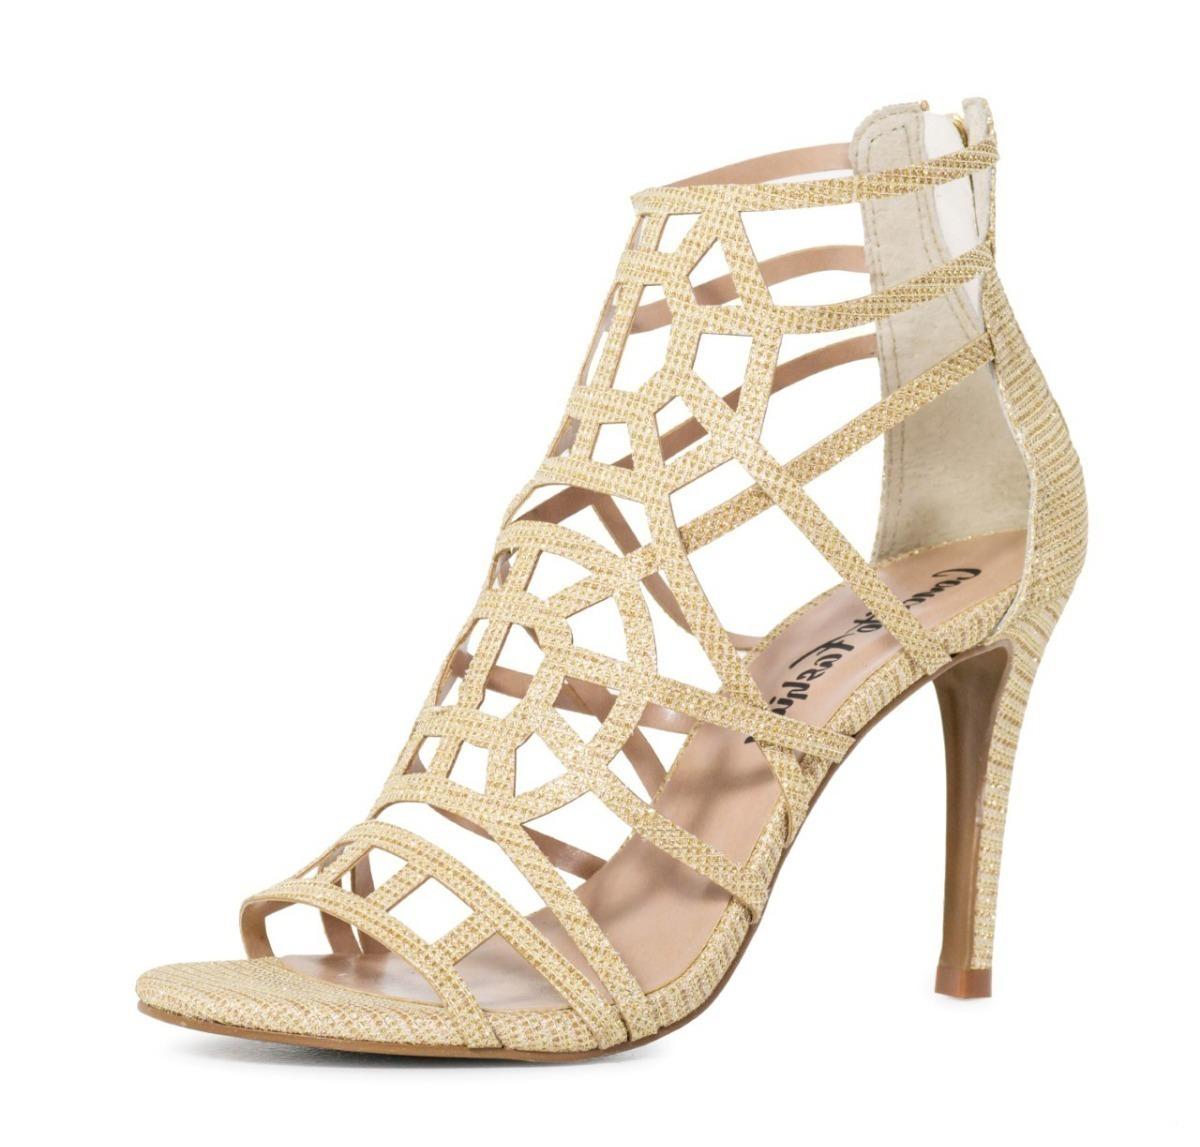 9cf37ca105 Sandalia Salto Luxo Dourada 731529 Promocao Liquidacao - R  69